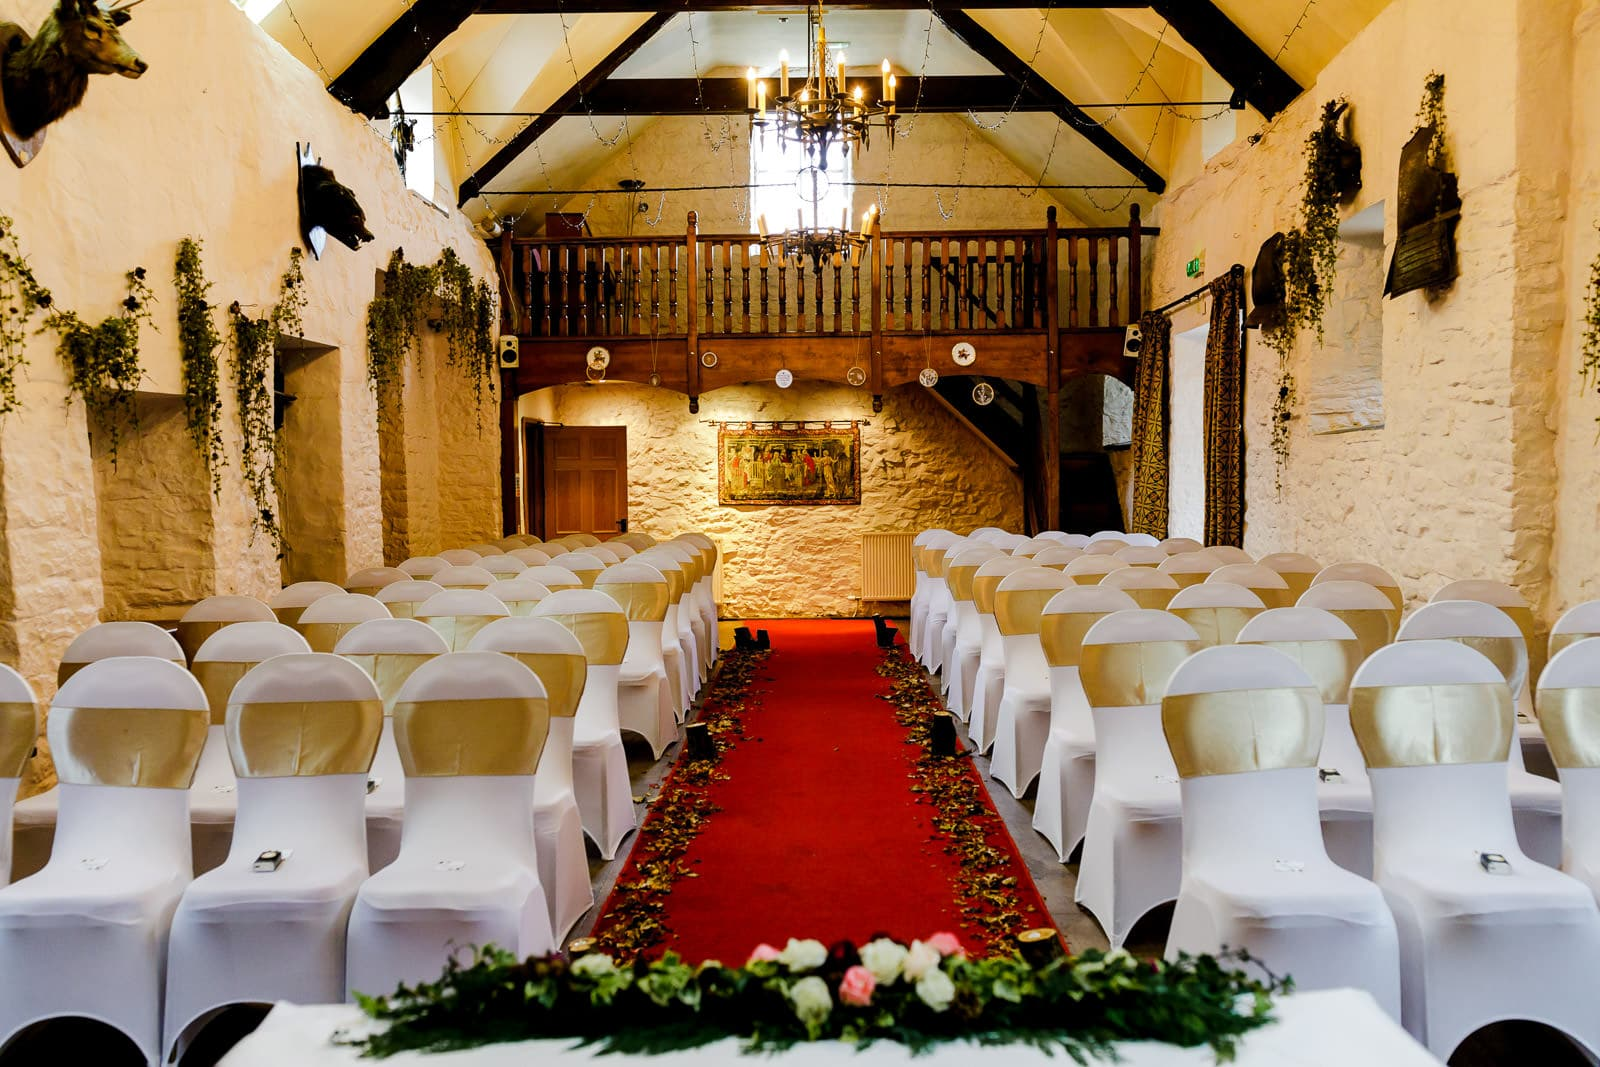 Miskin Manor Wedding Venue - Art by Design Photography